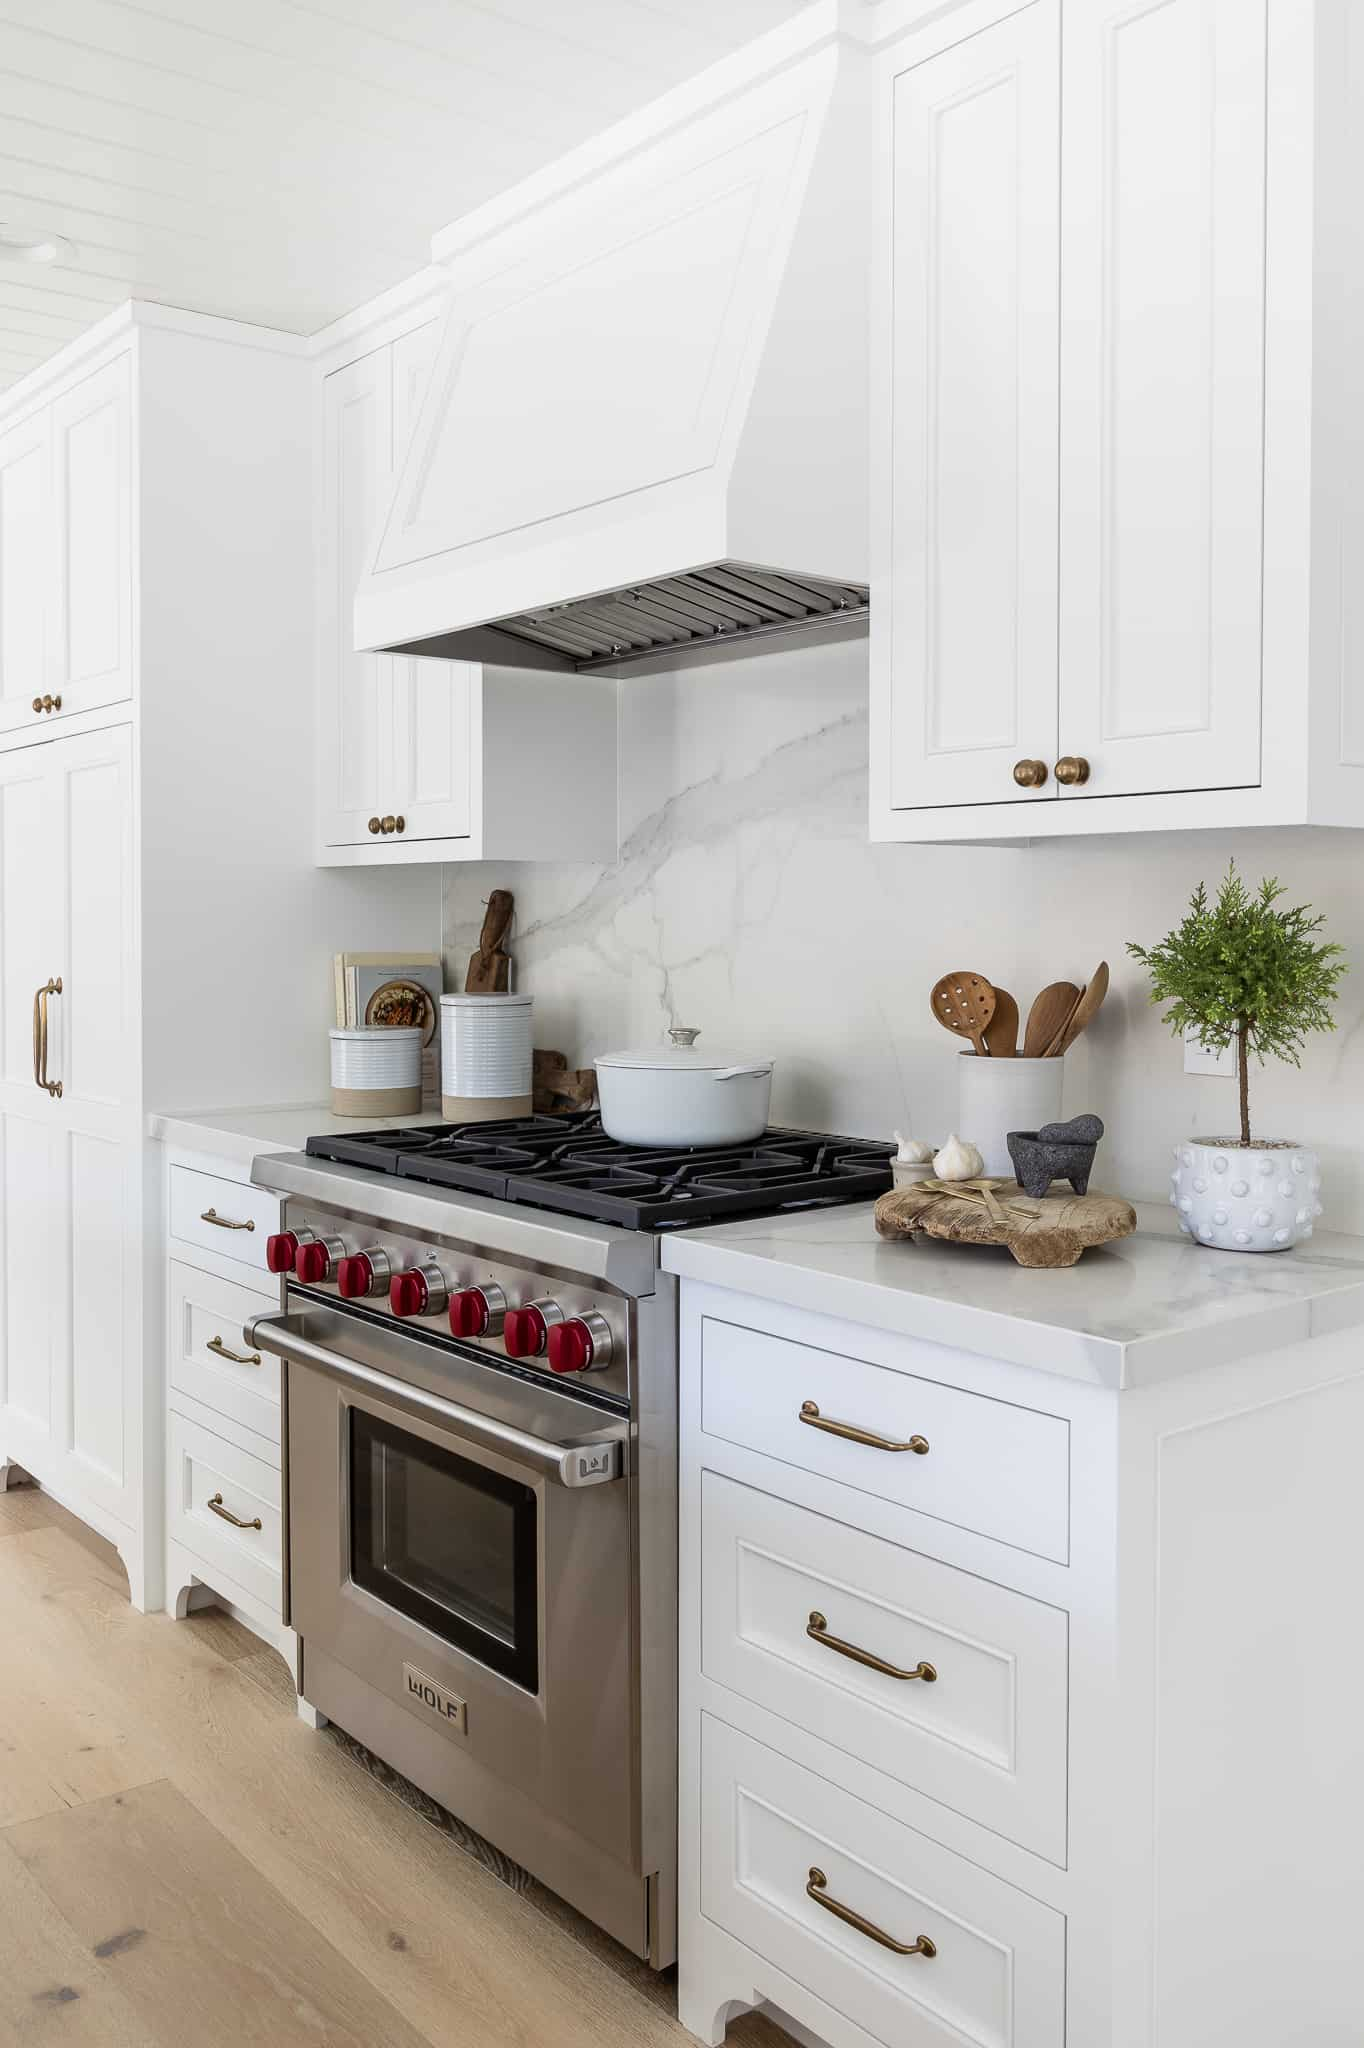 Port Newport Project - Mindy Gayer Design Co. - Kitchen Design